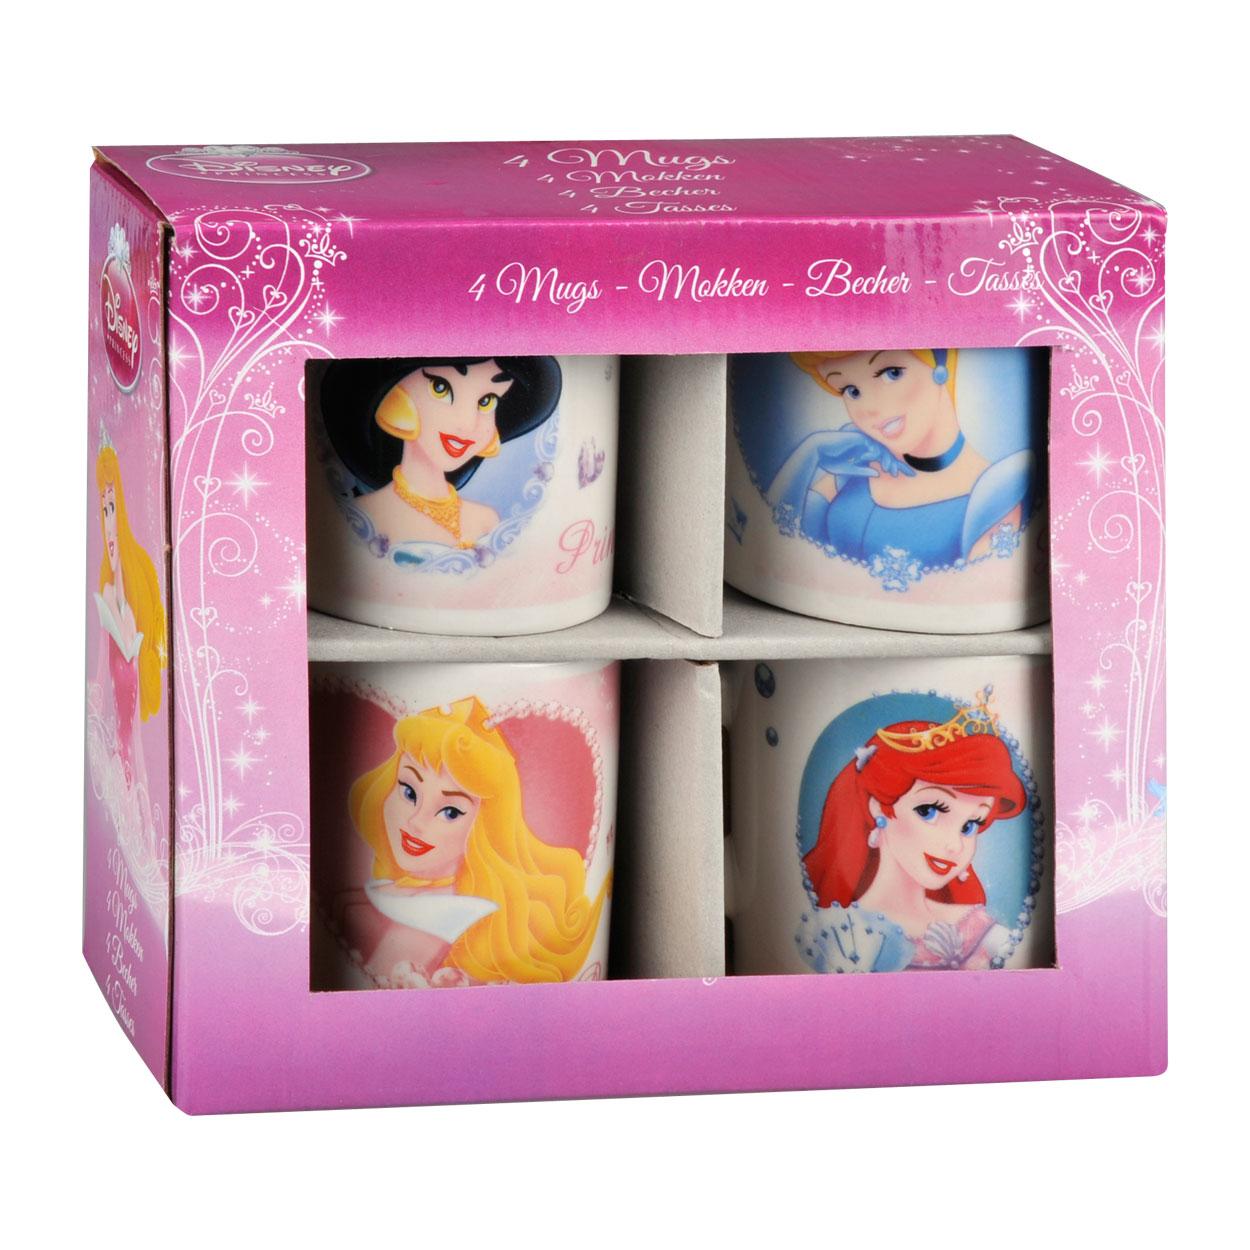 Hedendaags Disney Mok Klein Prinsessen, 4dlg online kopen   Lobbes Speelgoed BE-07